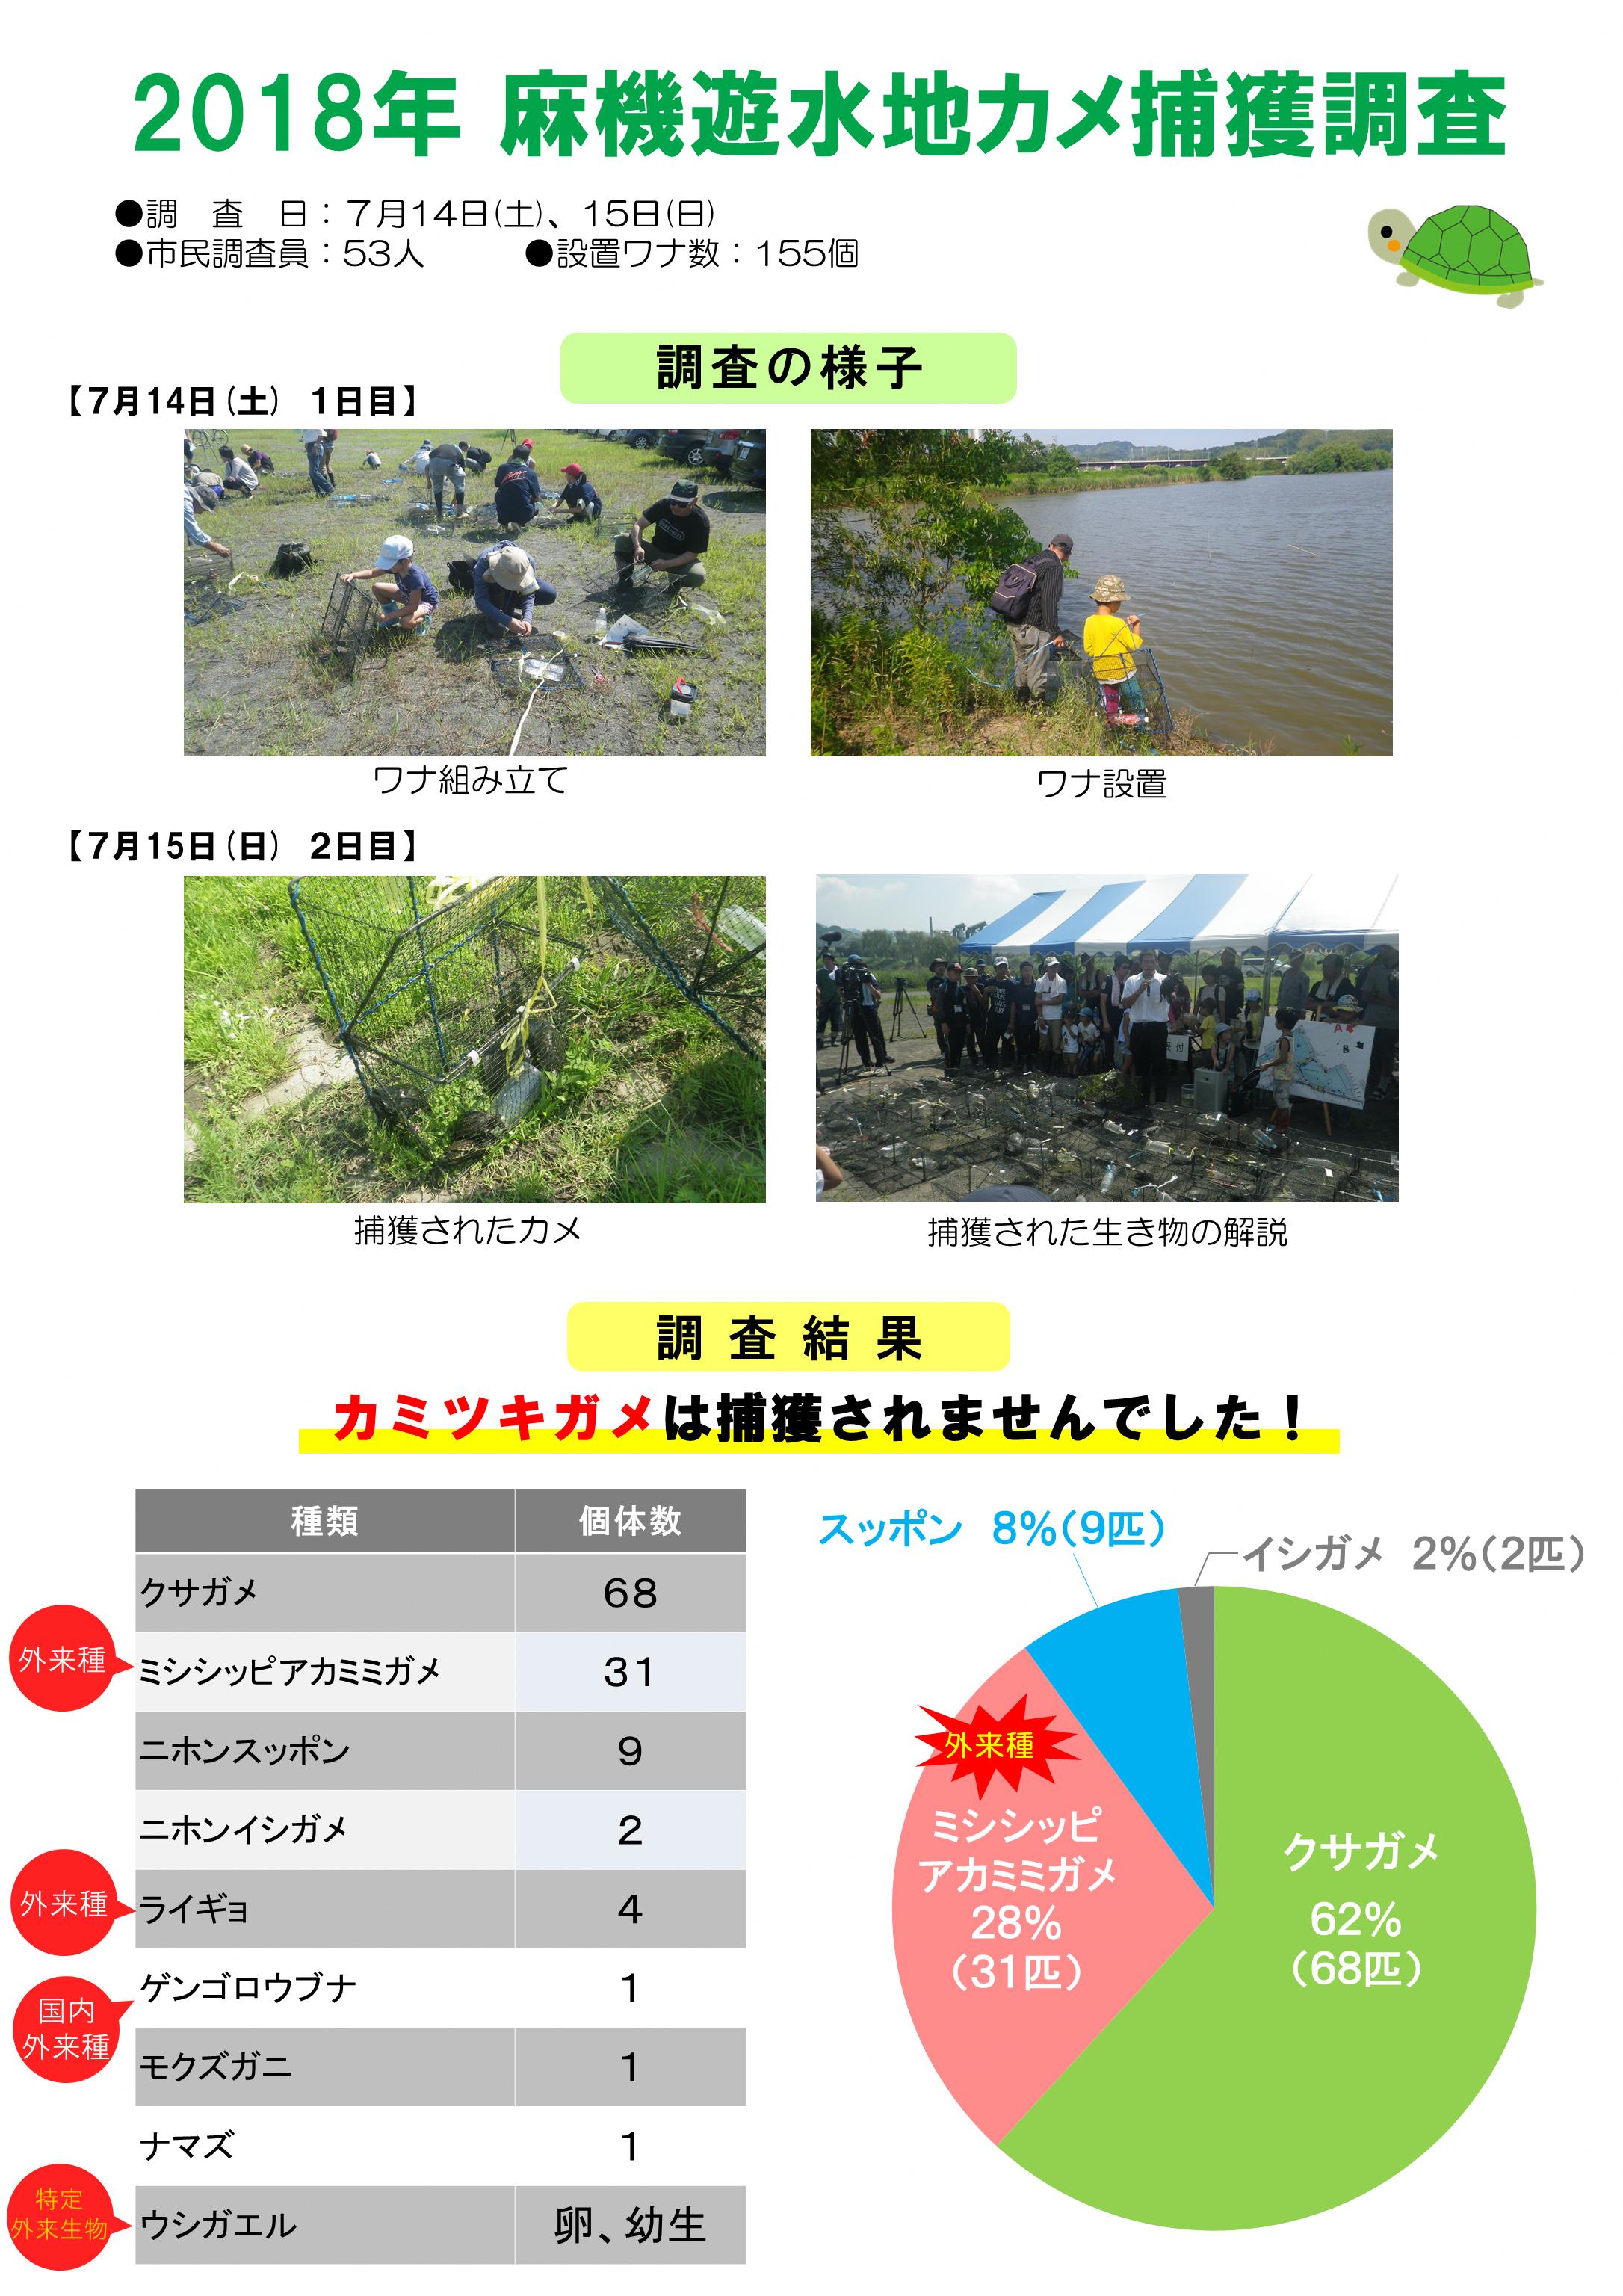 http://www.shizutan.jp/learning/2018/07/31/images/%E8%AA%BF%E6%9F%BB%E5%A0%B1%E5%91%8A%EF%BC%91.png